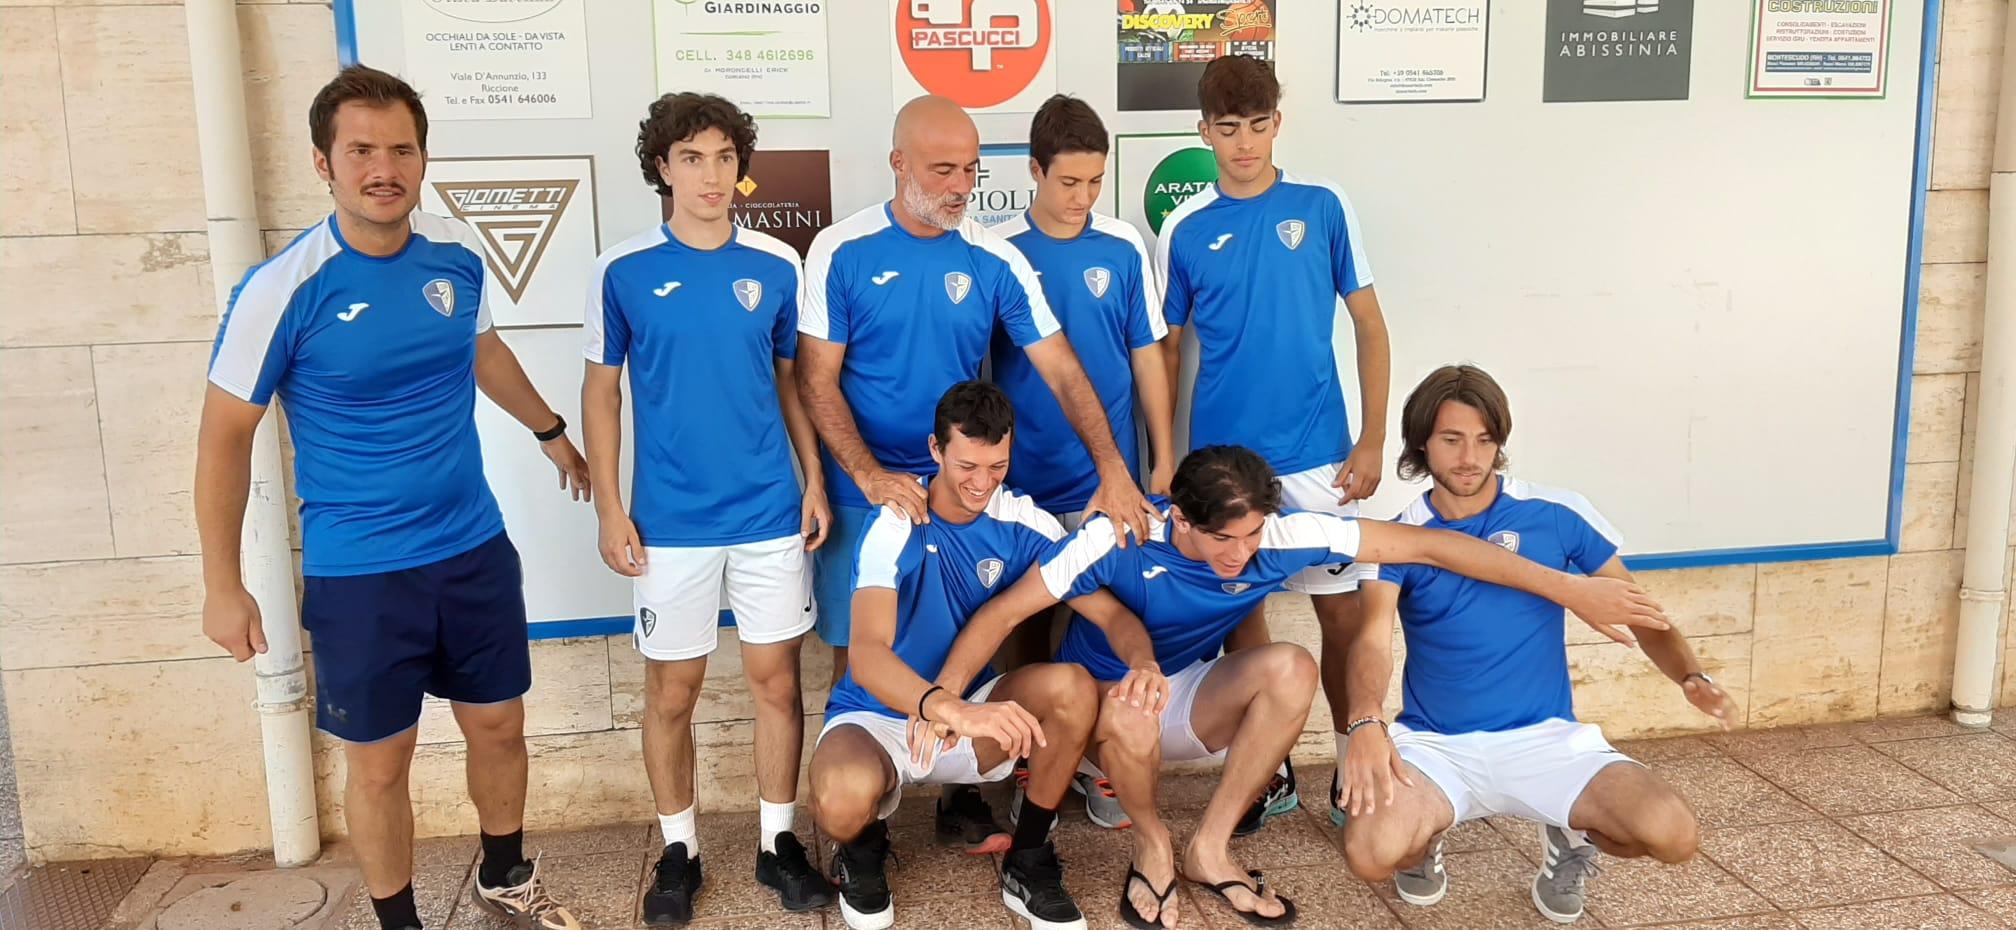 Tennis Club Riccione: serie C maschile